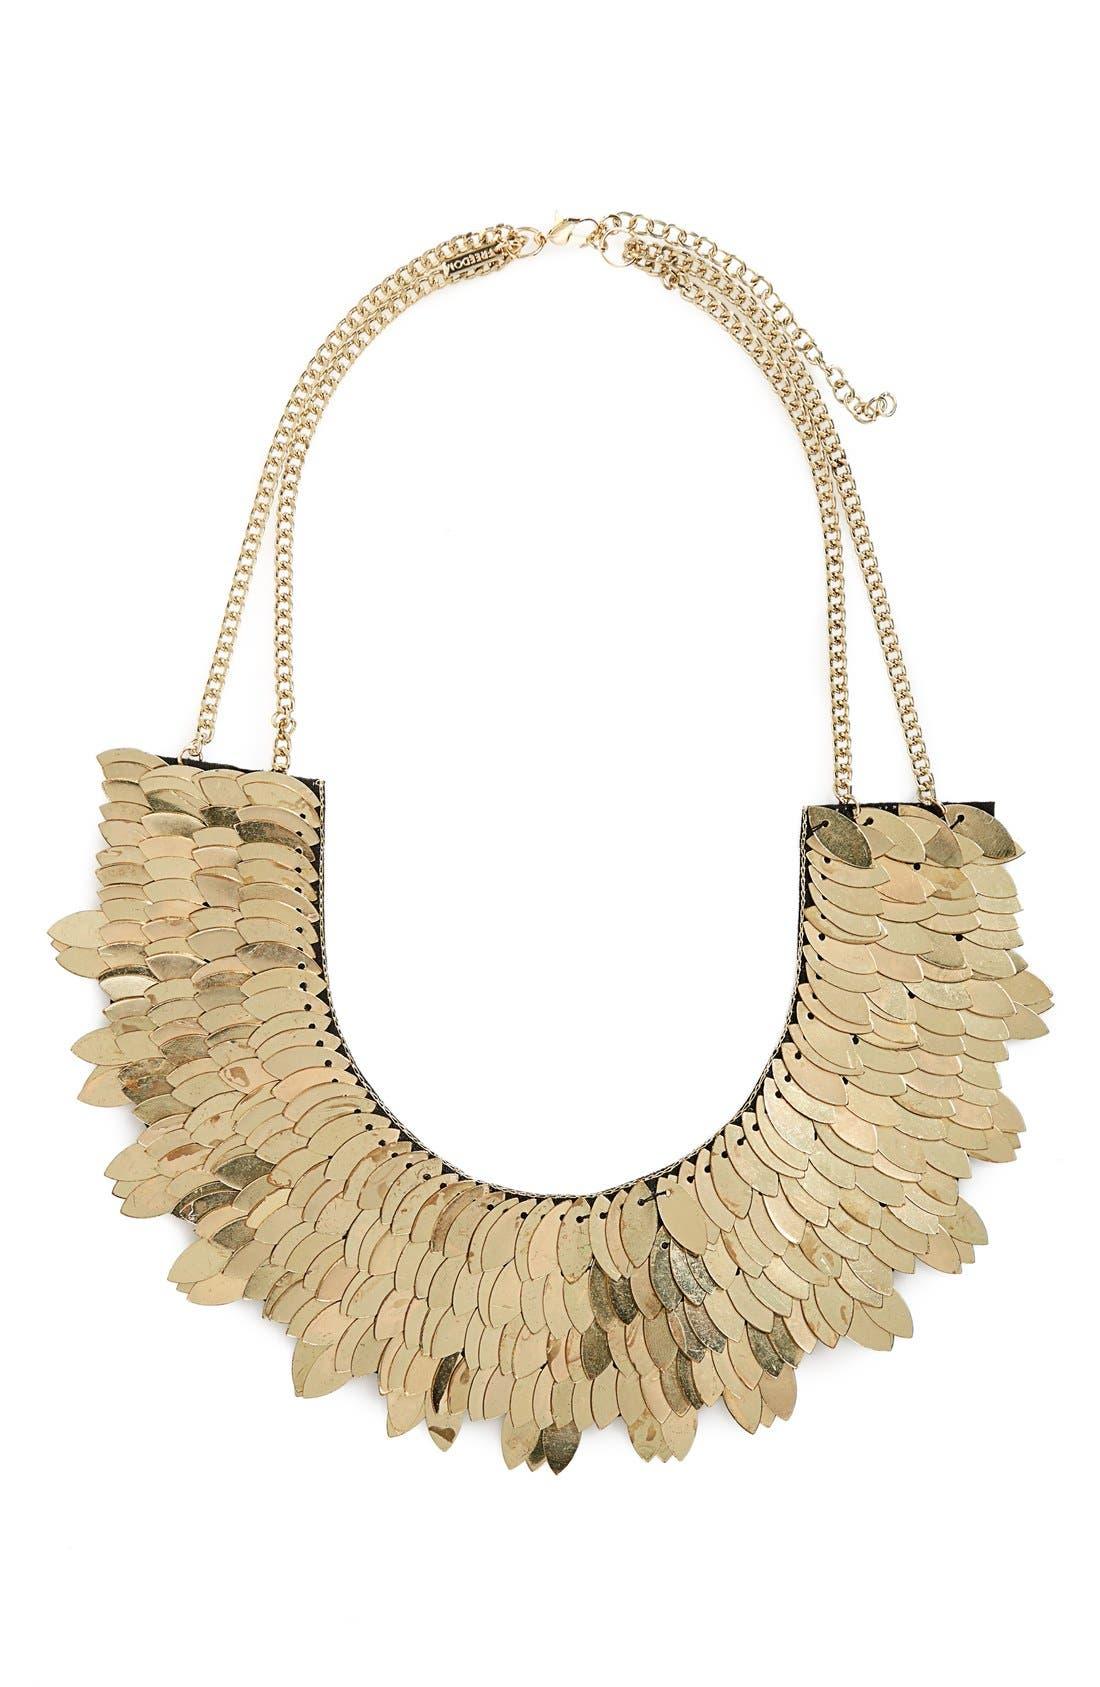 Alternate Image 1 Selected - Topshop Metallic Leaf Necklace